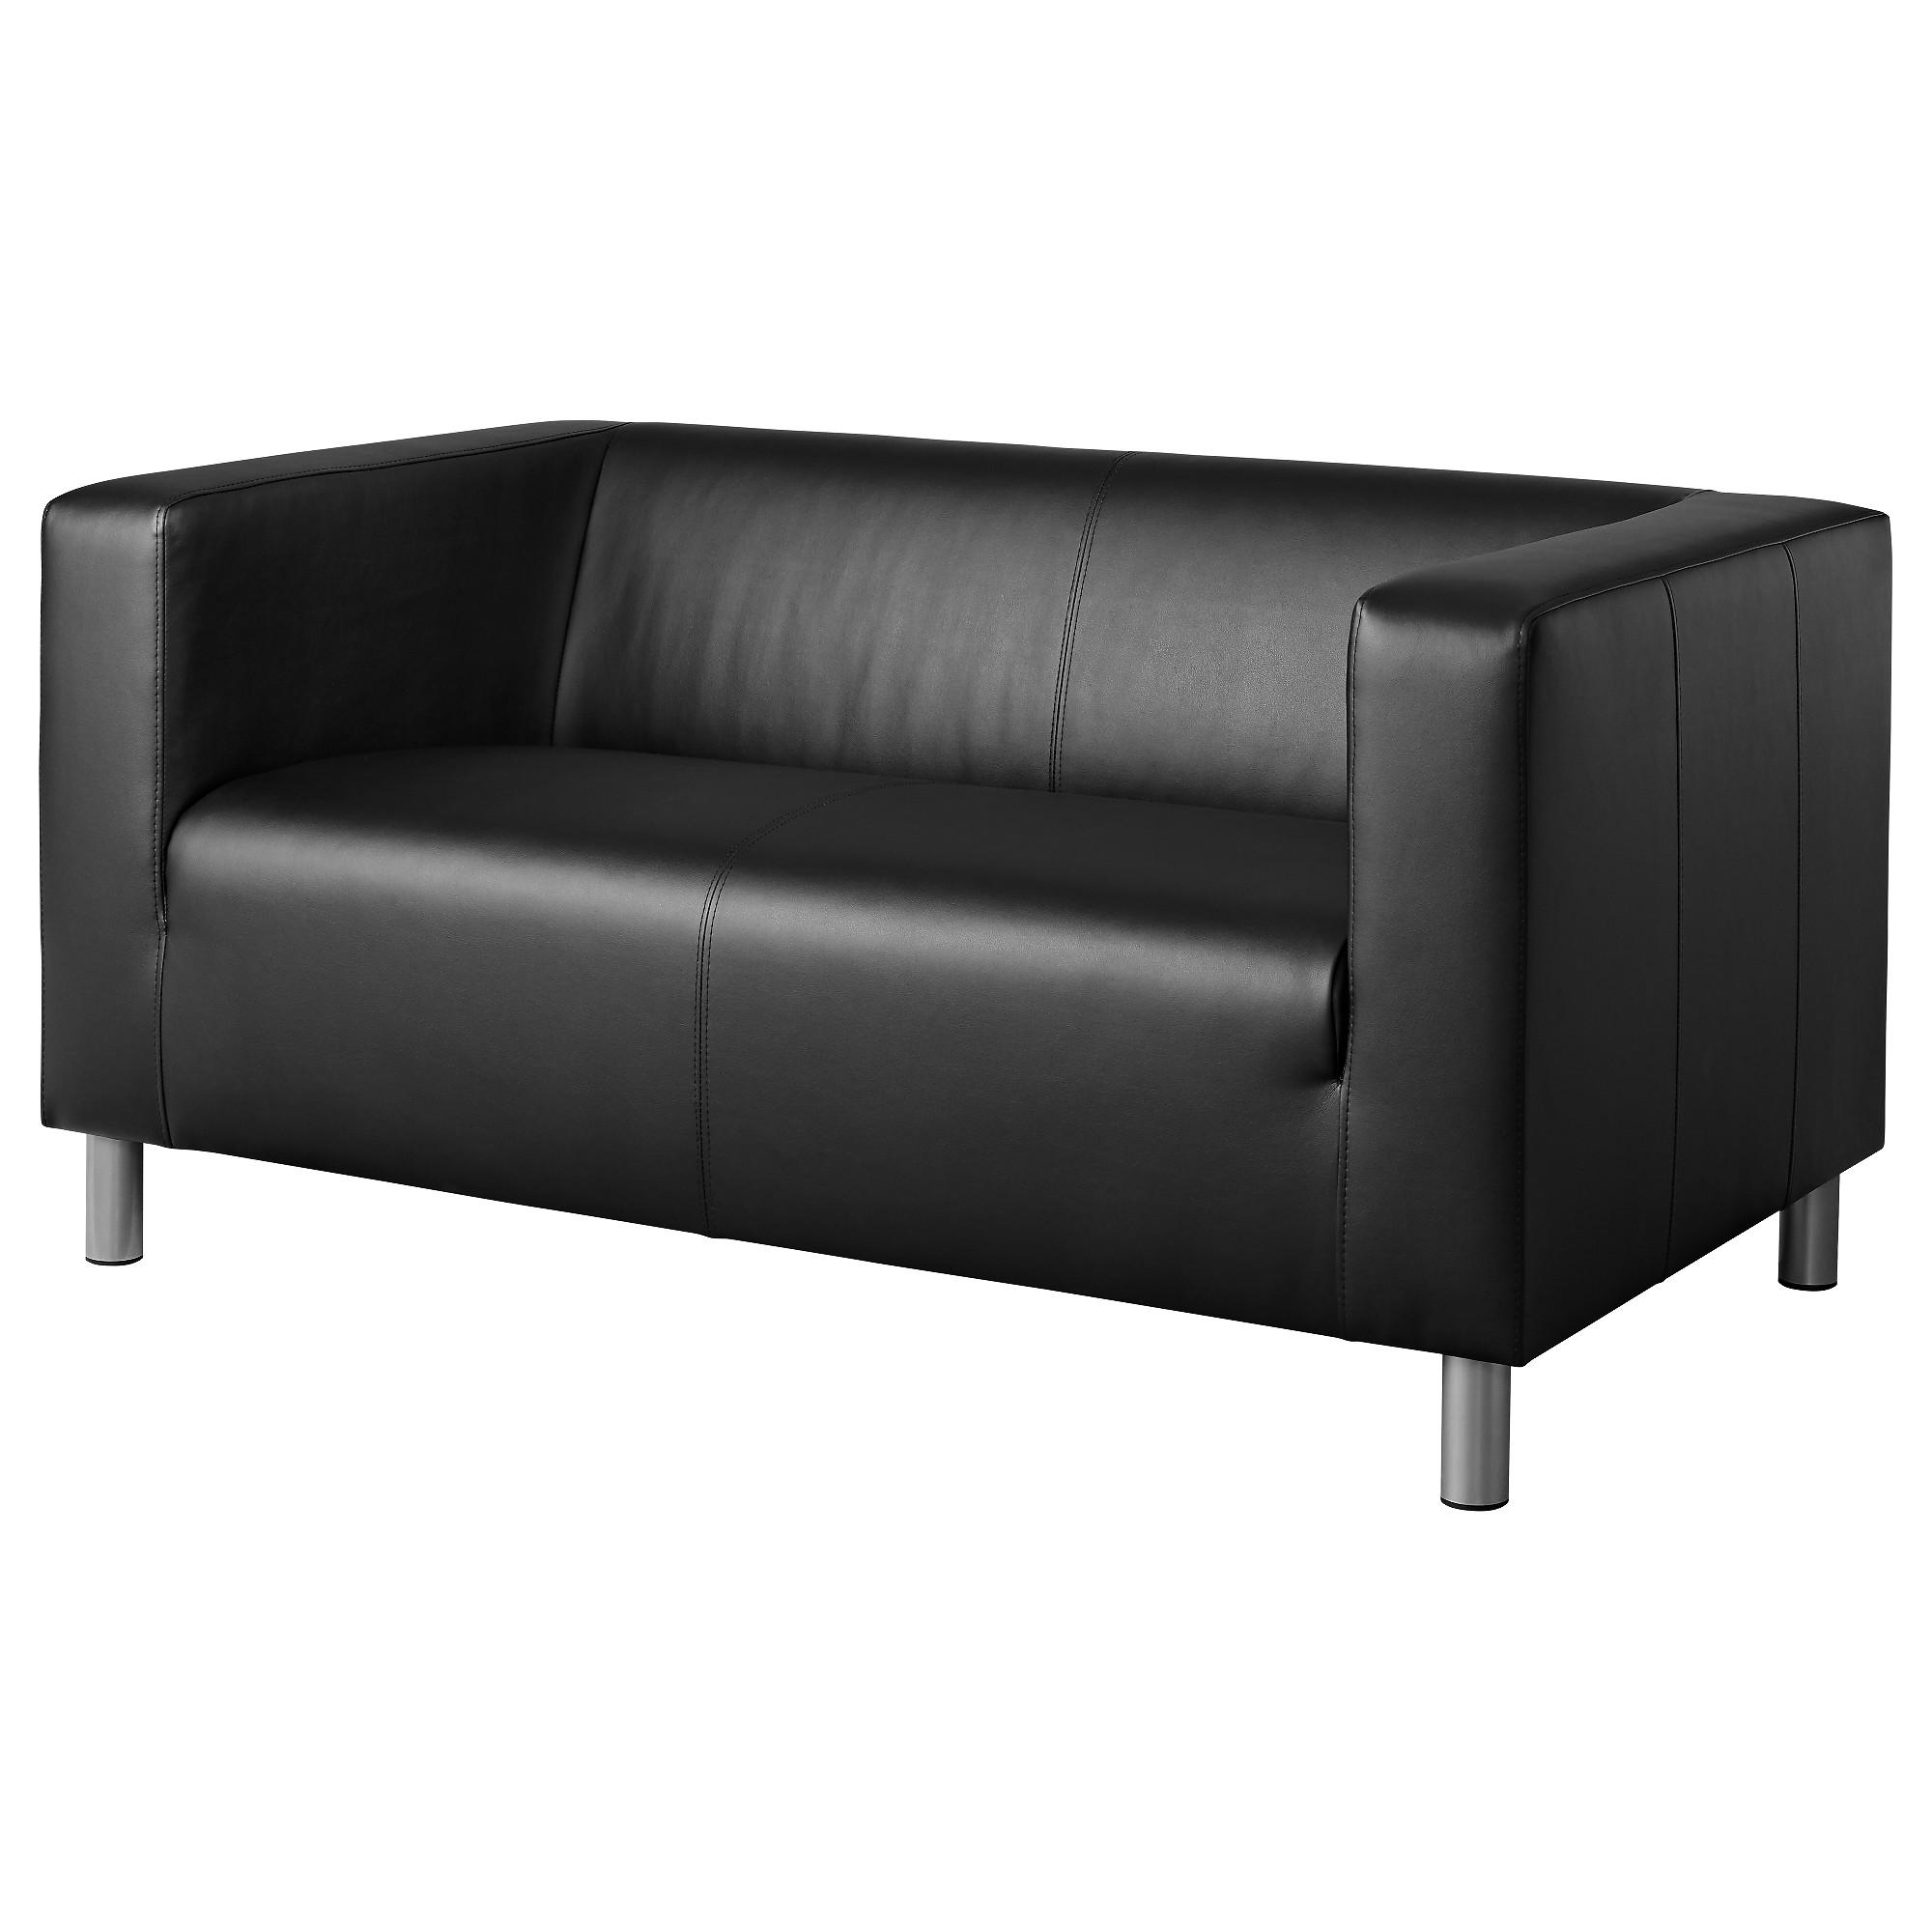 two seater sofa ikea klippan compact 2-seat sofa CTXPLBN